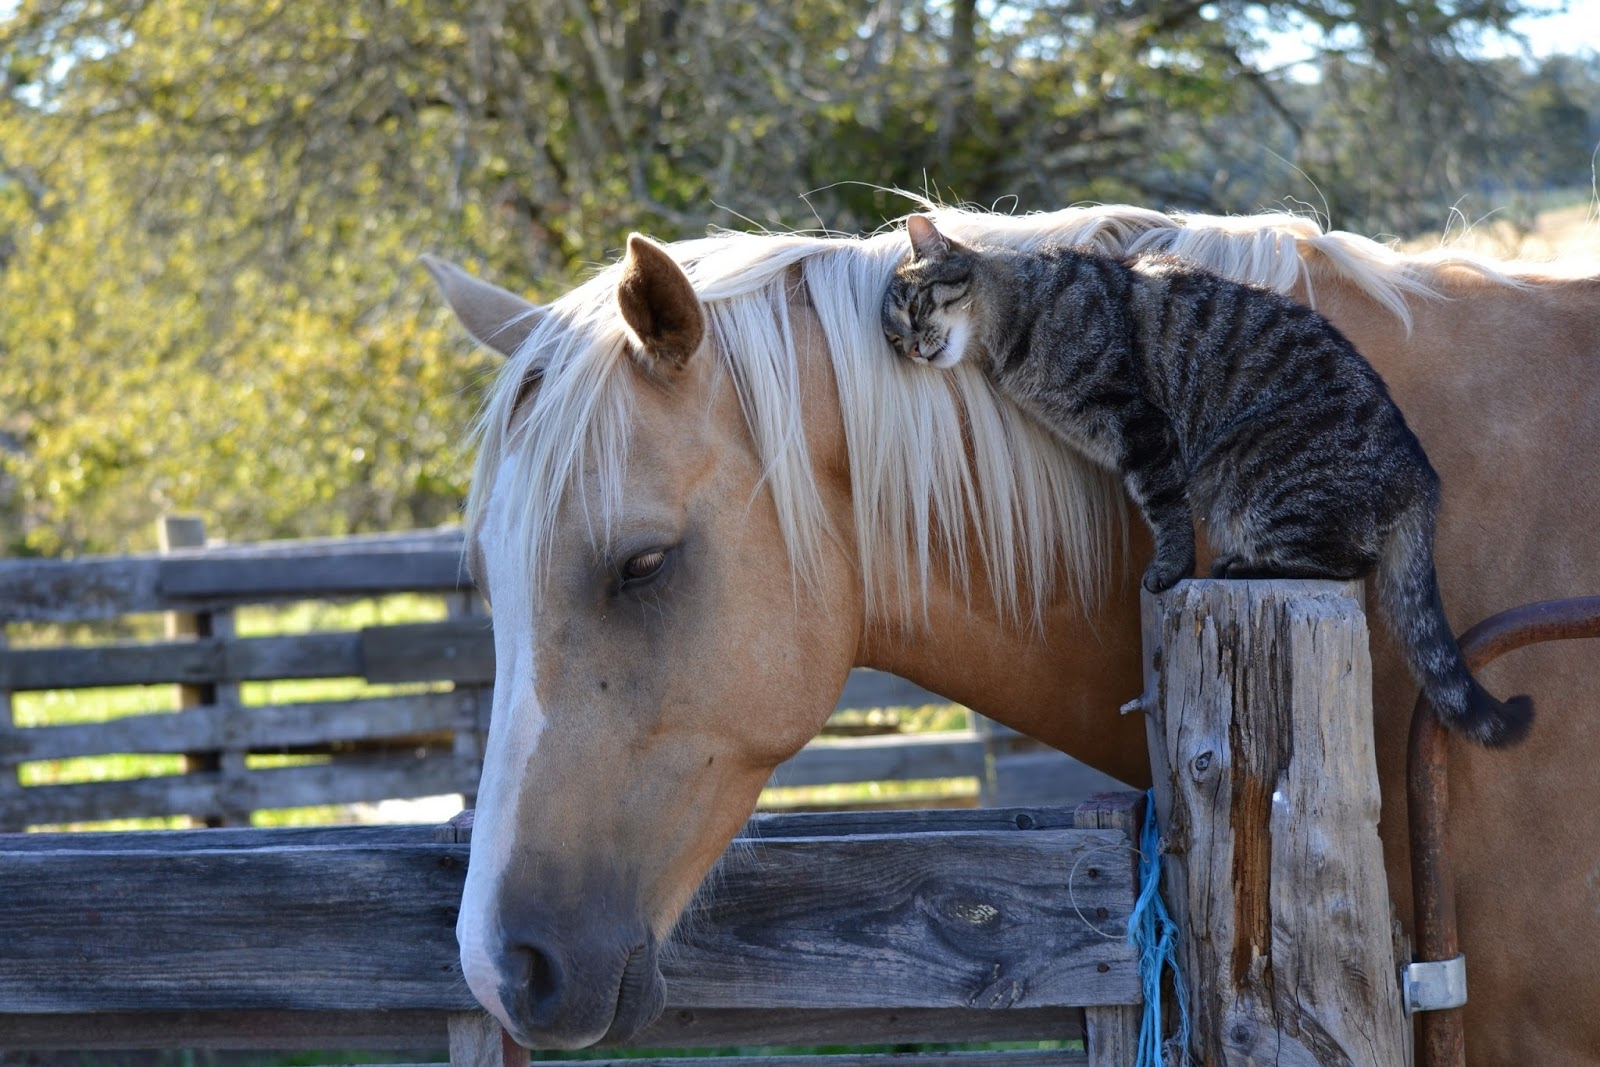 https://2.bp.blogspot.com/-gL5DqY0ZfTs/VrayY3P5pbI/AAAAAAAAFrU/97zQgKy82X0/s1600/beautiful-white-horse-images-with-sweet-cat.jpg